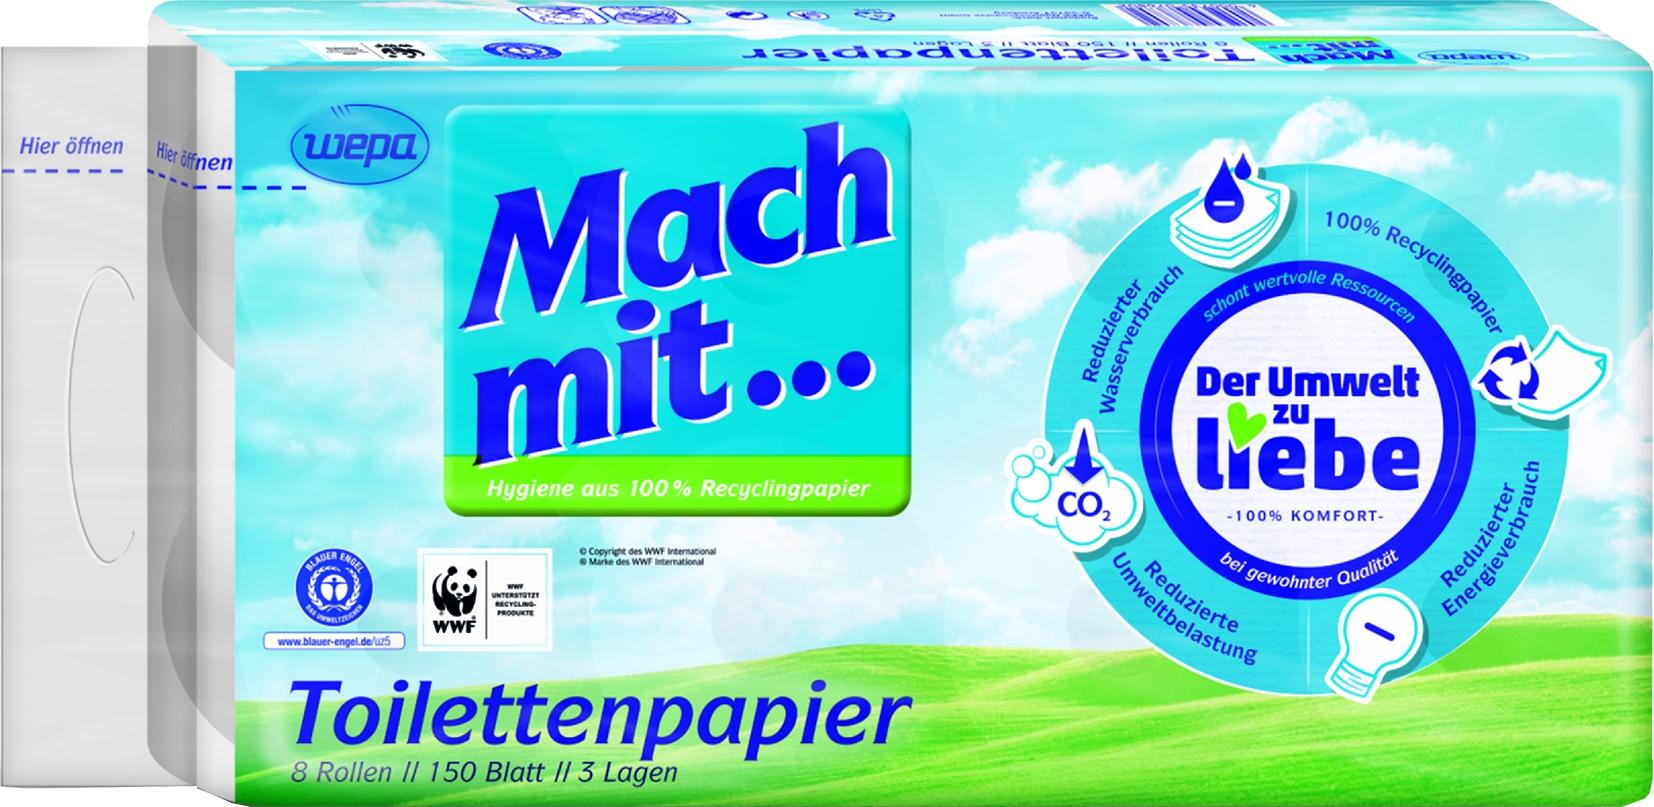 Toilettenpapier 3-lagig 8x150 Blatt